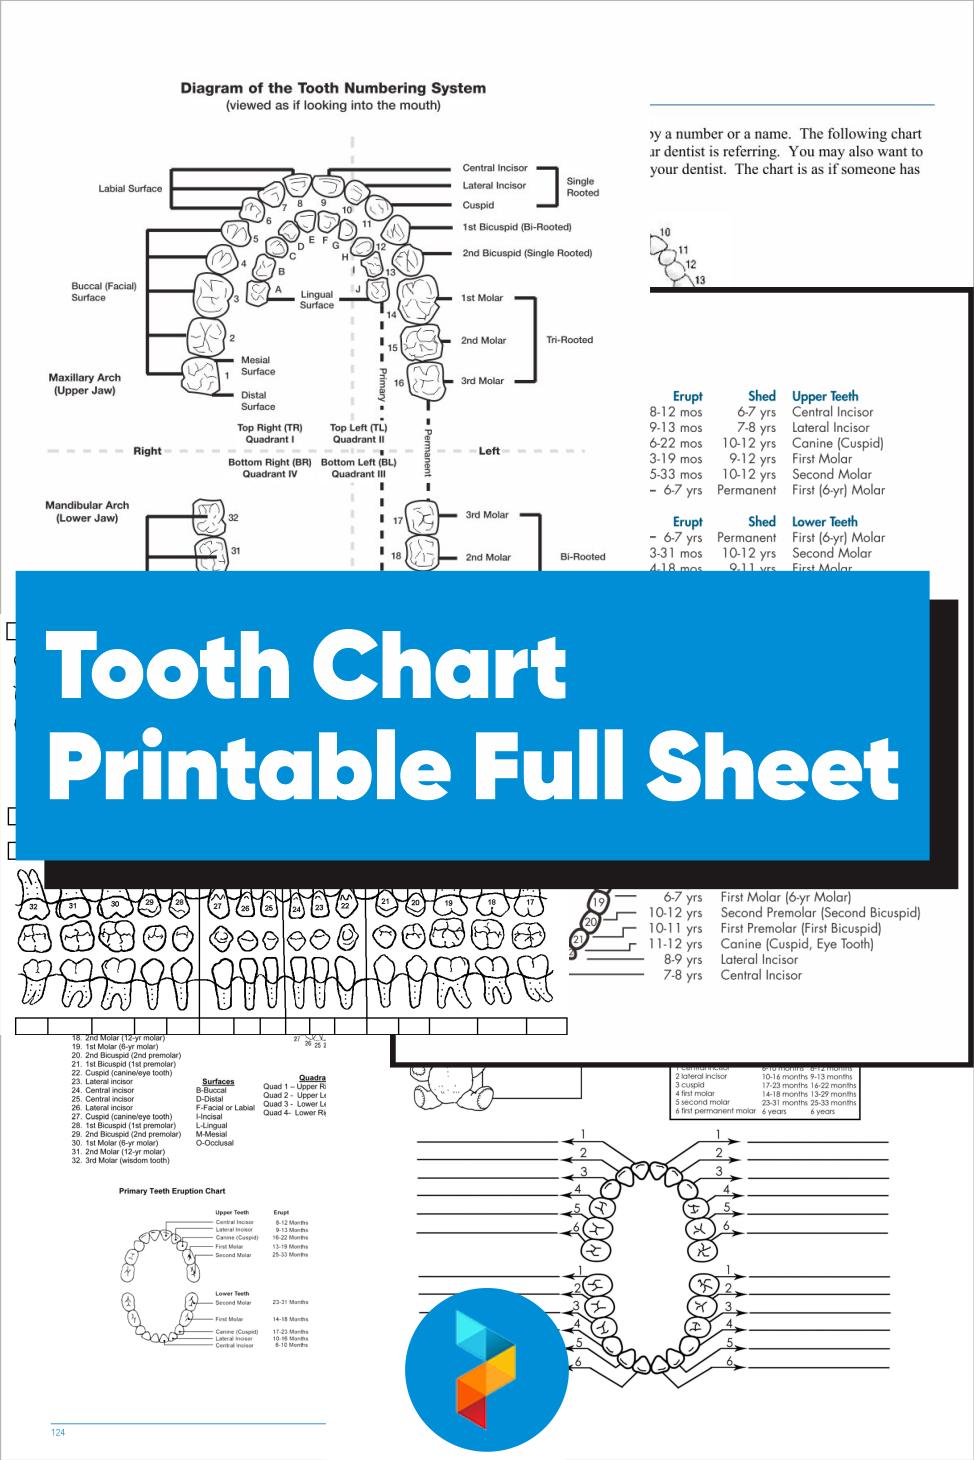 Tooth Chart Printable Full Sheet